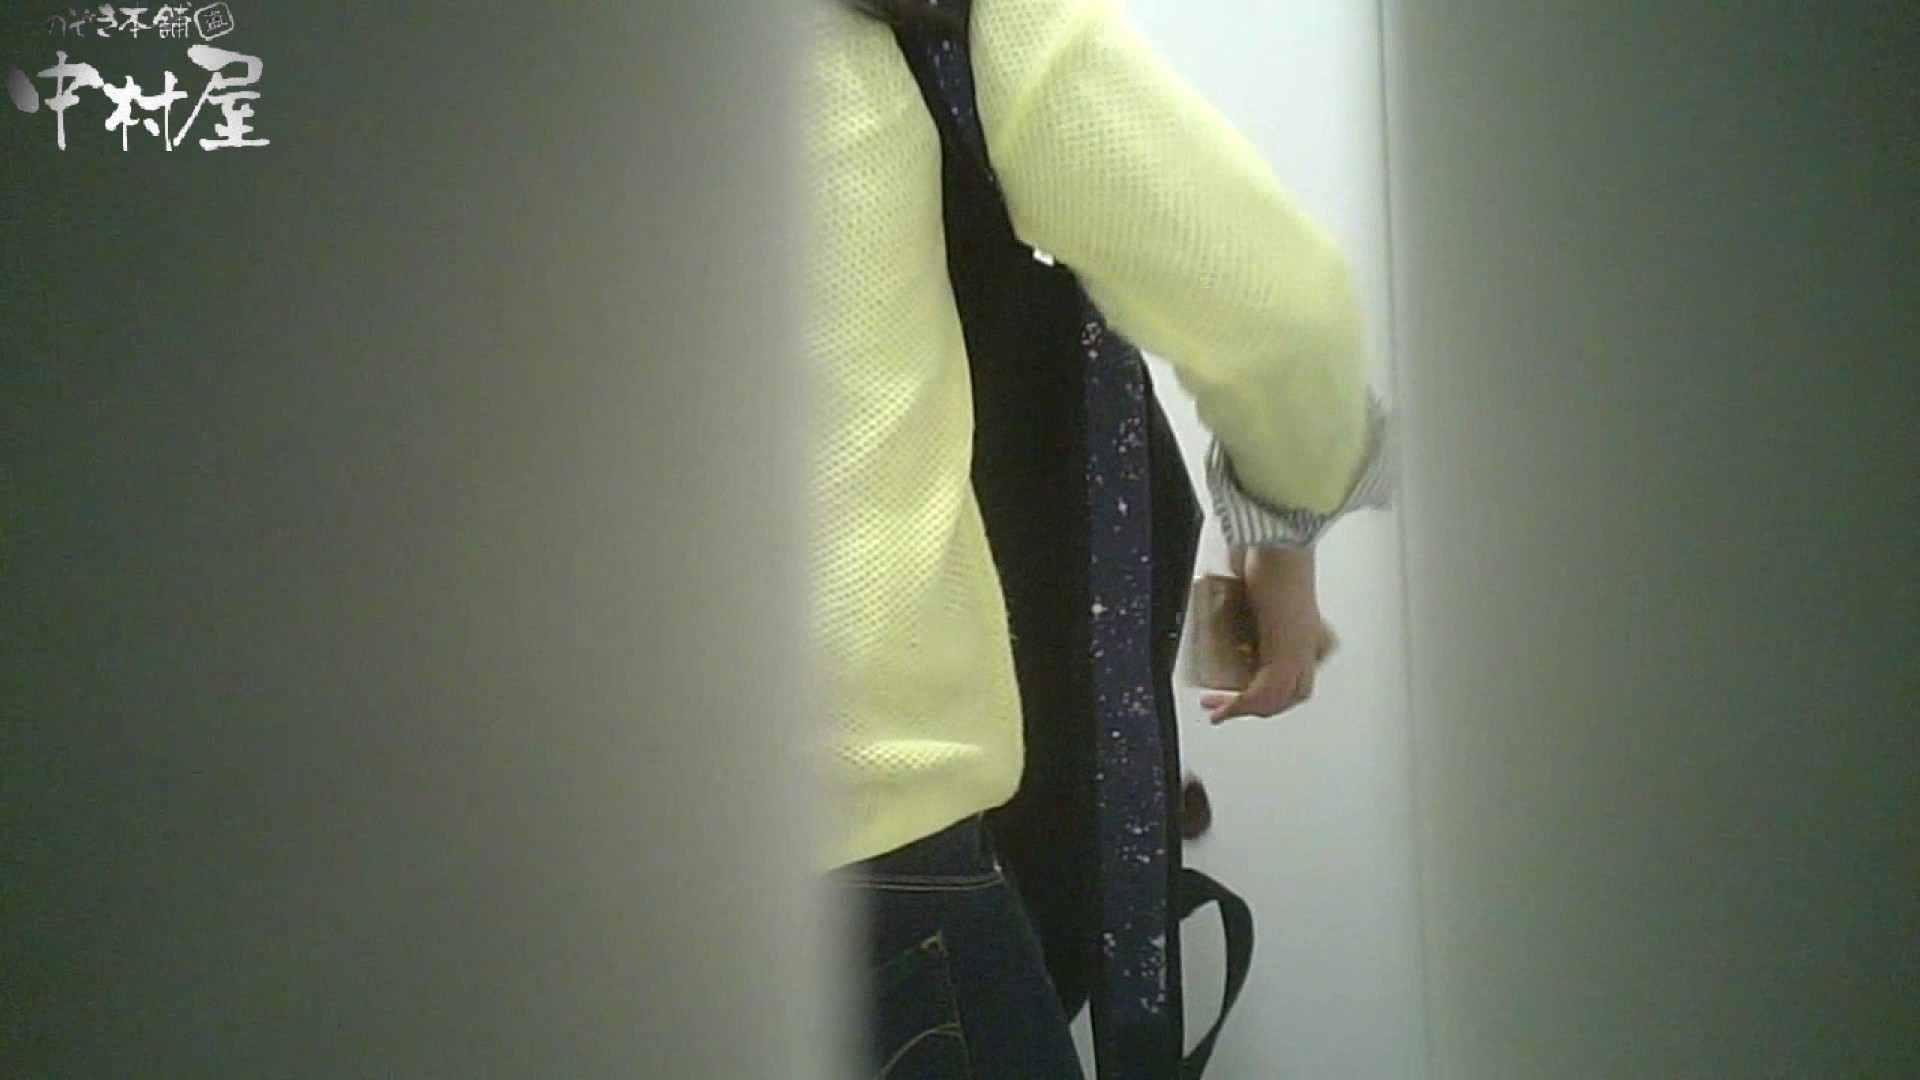 【某有名大学女性洗面所】有名大学女性洗面所 vol.35 安定の2カメ 最近の女性は保守的な下着が多め? 下着   潜入画像  83画像 57